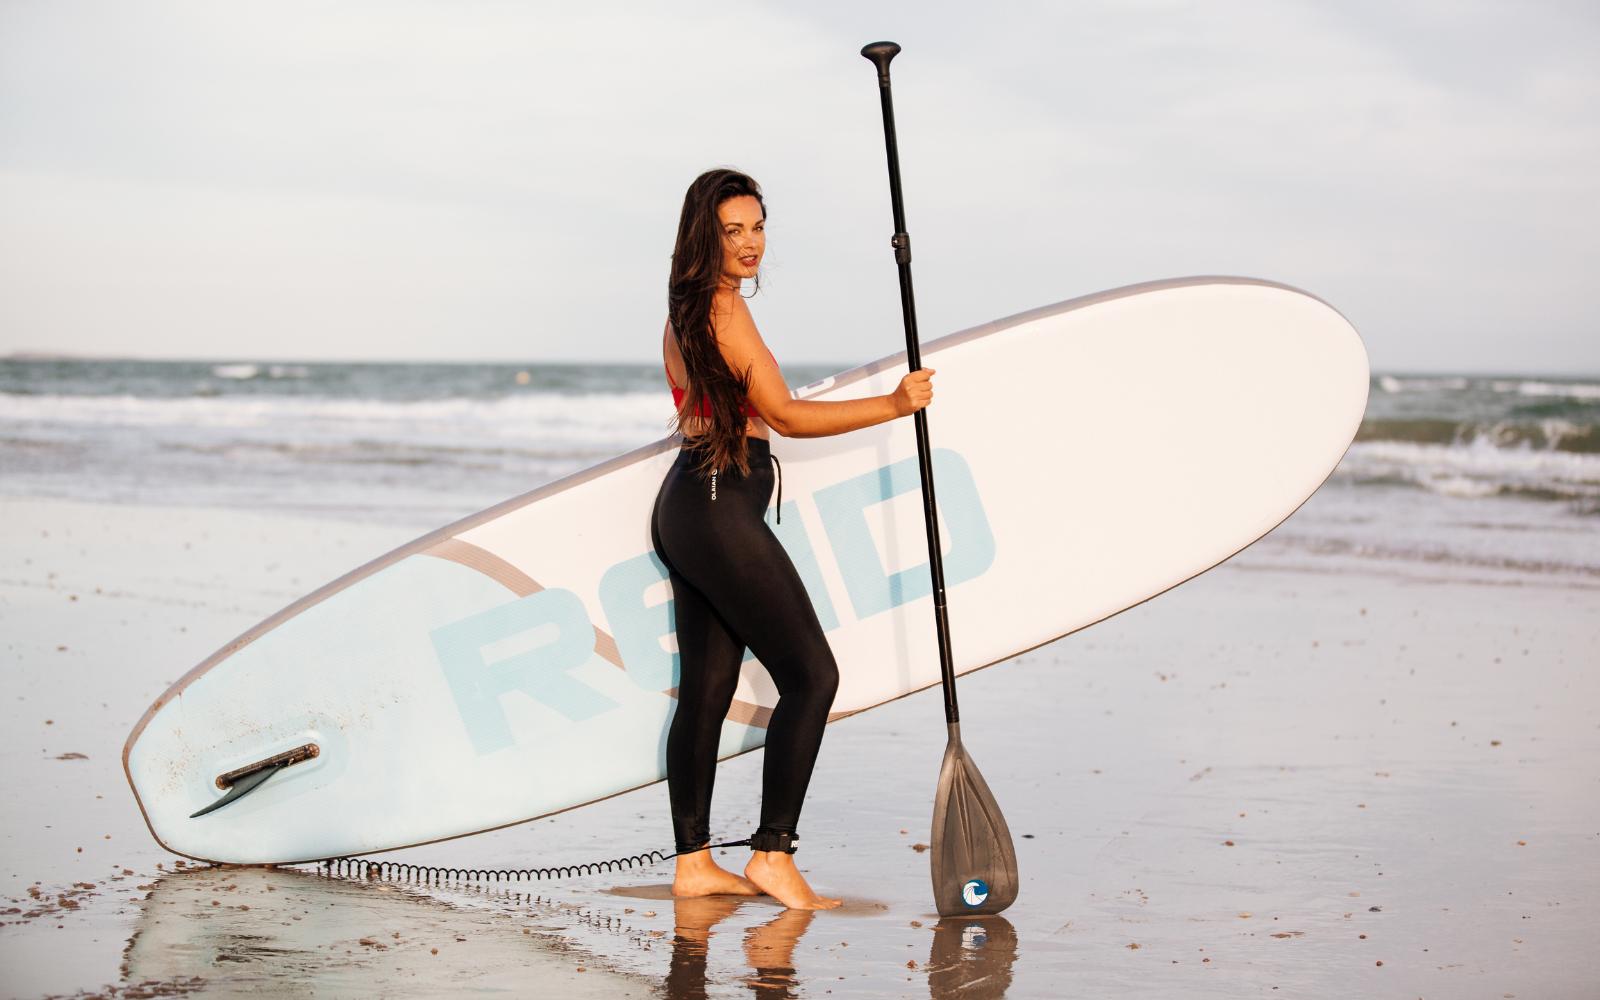 8 19 - Reid ® - Reid Santa Monica 10'6 Paddleboard